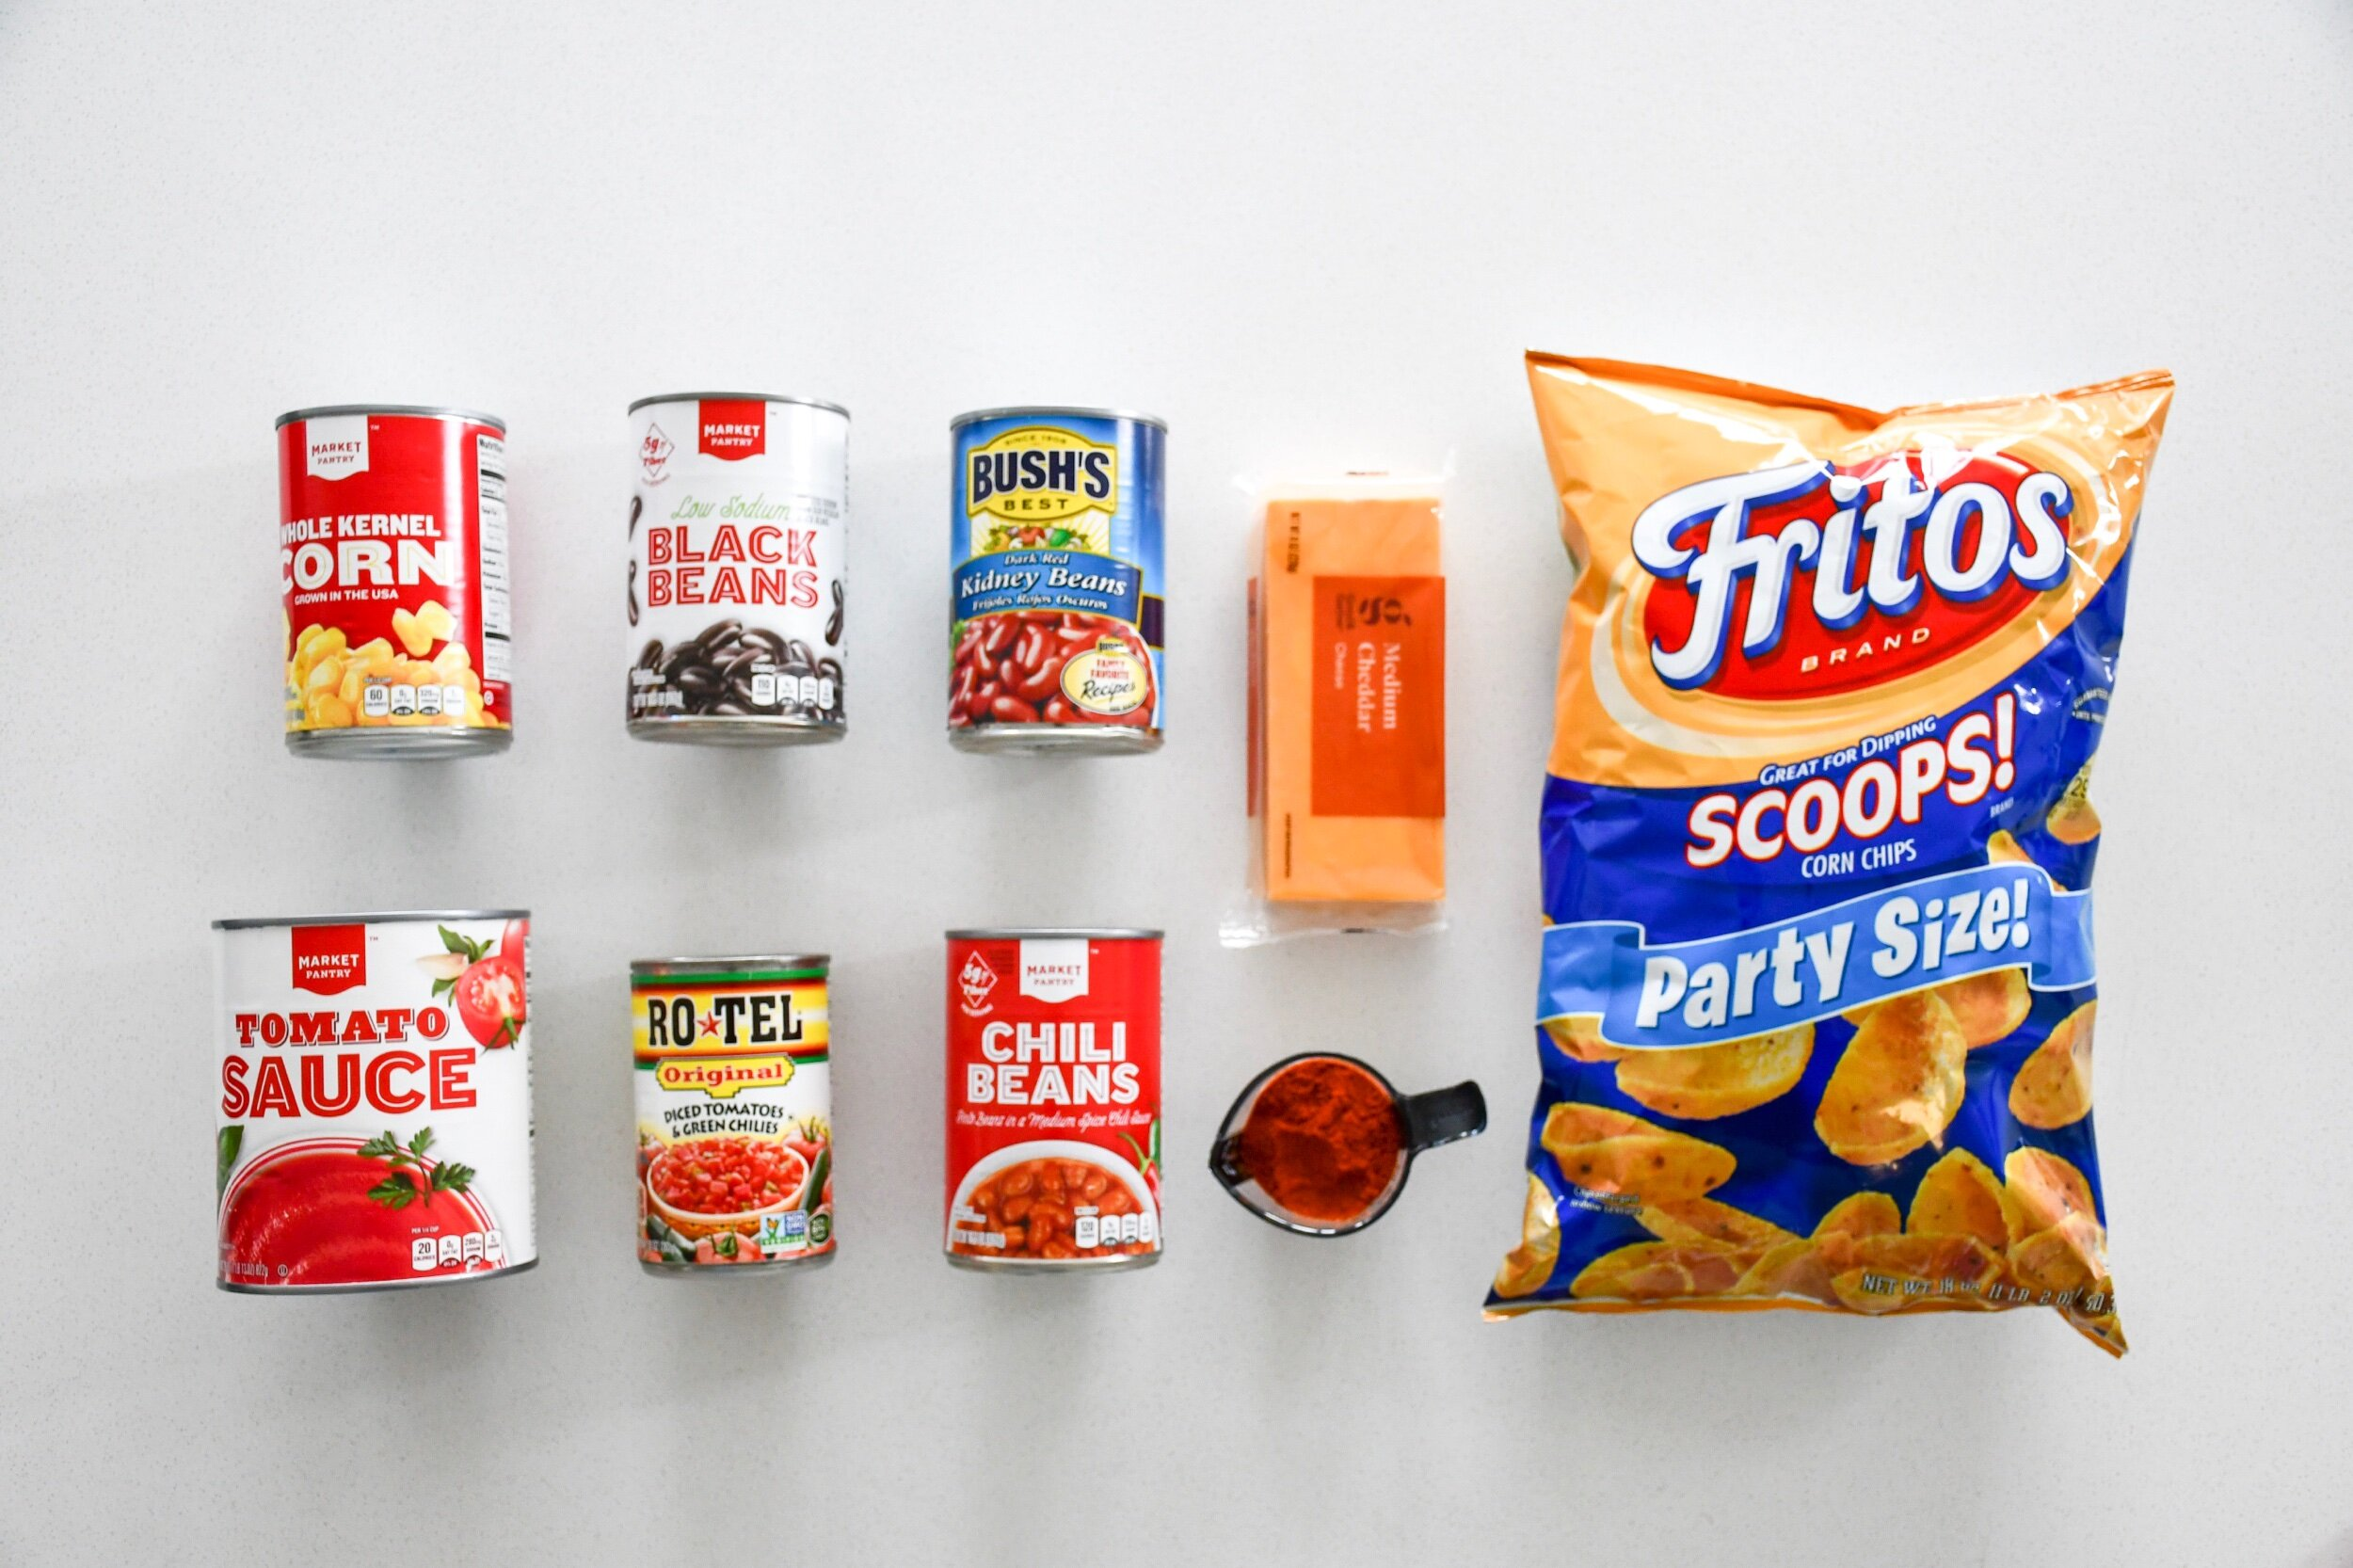 www.tarynintotravel.com | Easy Gluten Free Crockpot Chili | #glutenfreedinner #glutenfreecrockpot #glutenfreeideas